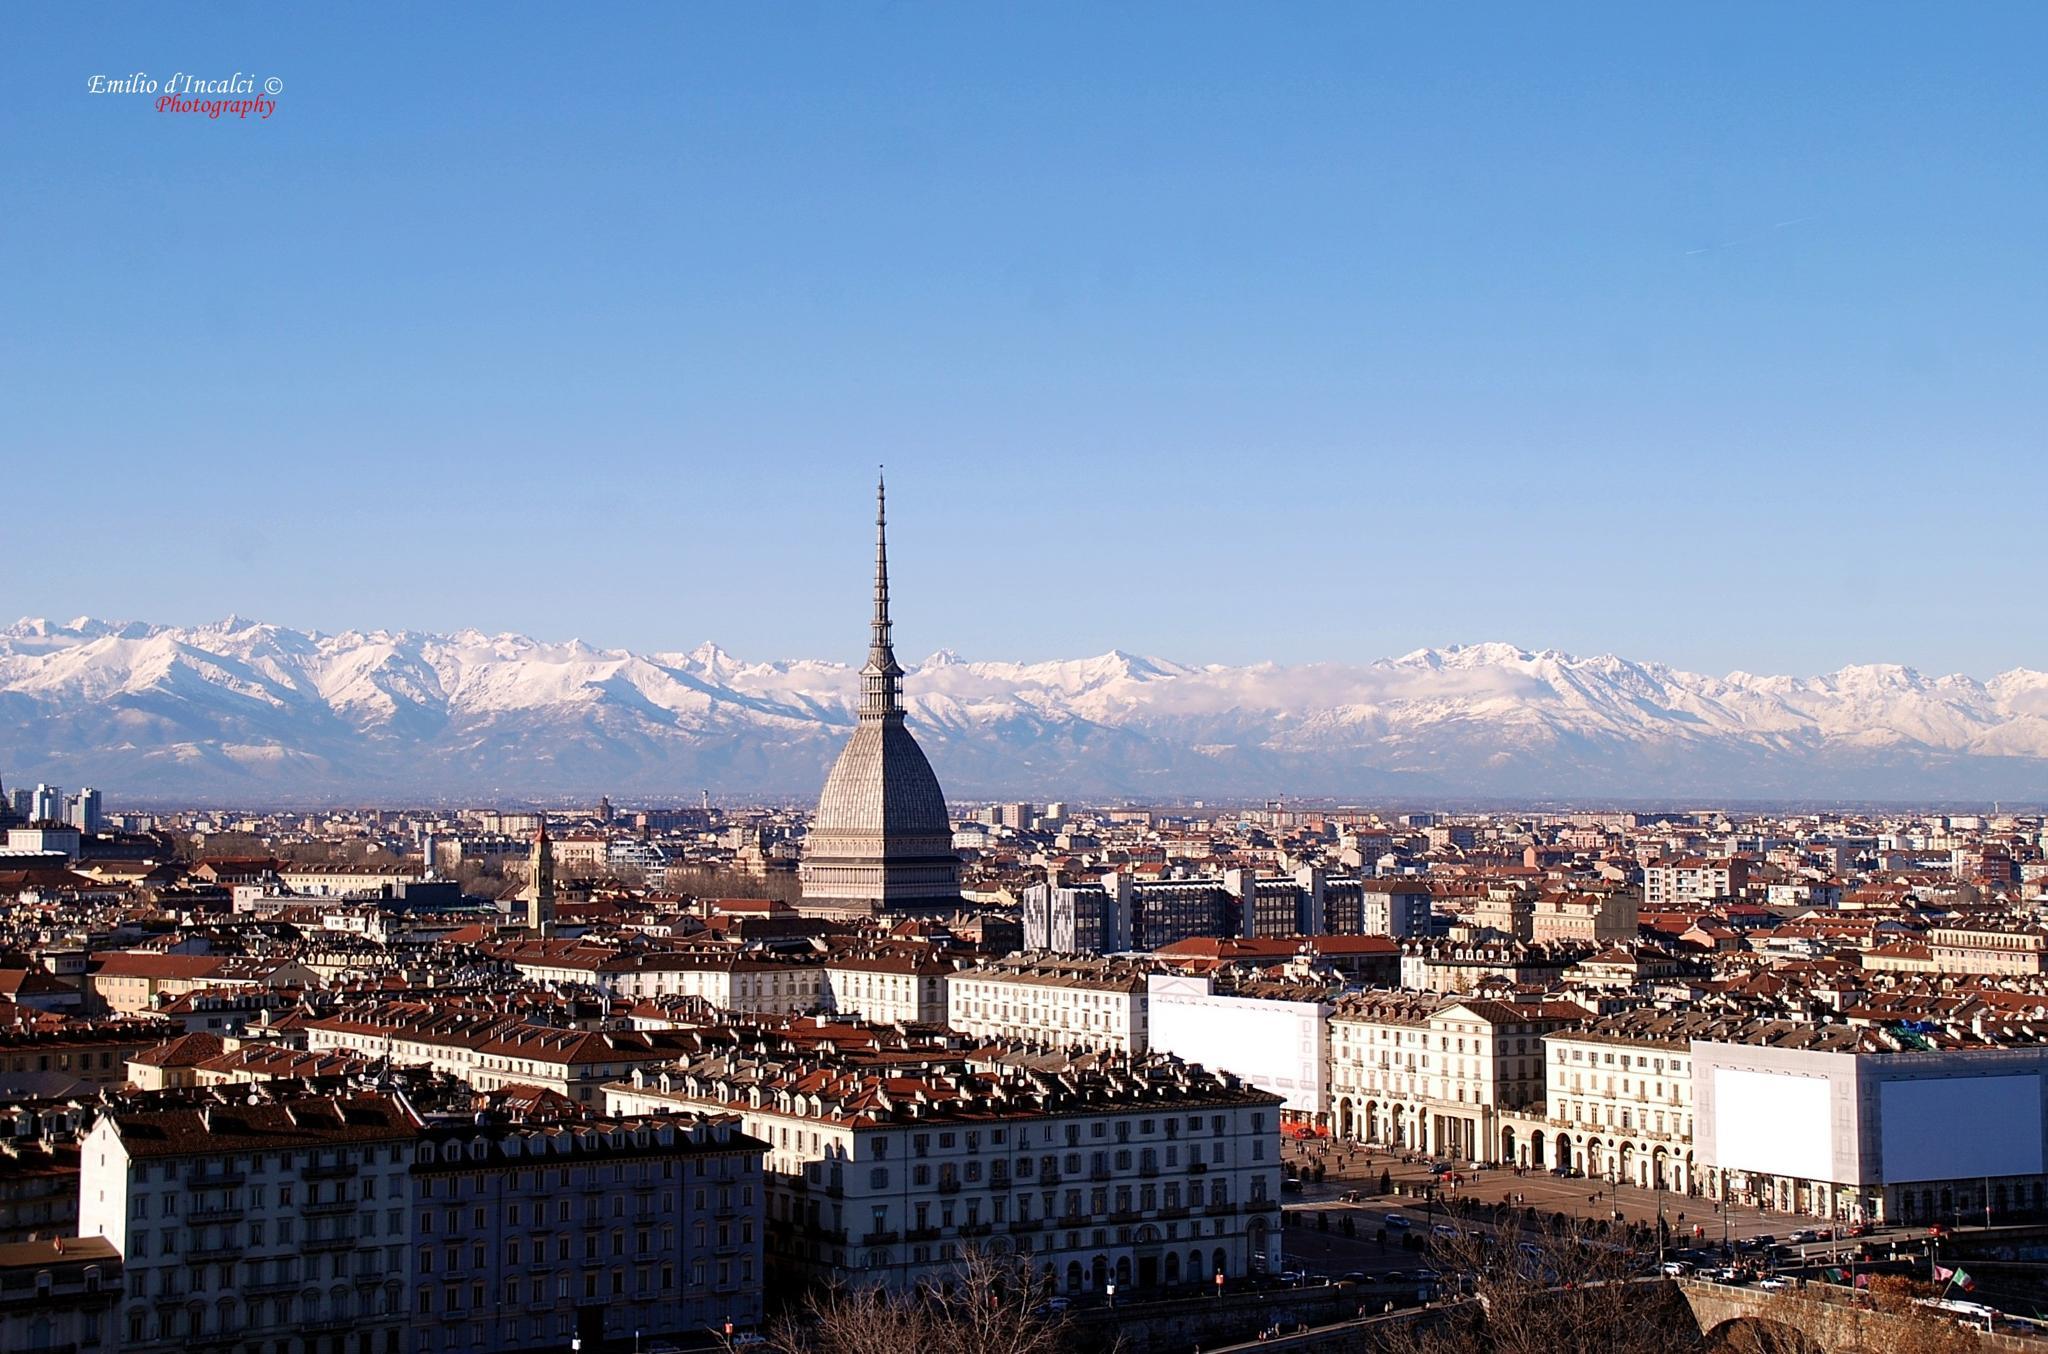 Turin by Emilio d'Incalci